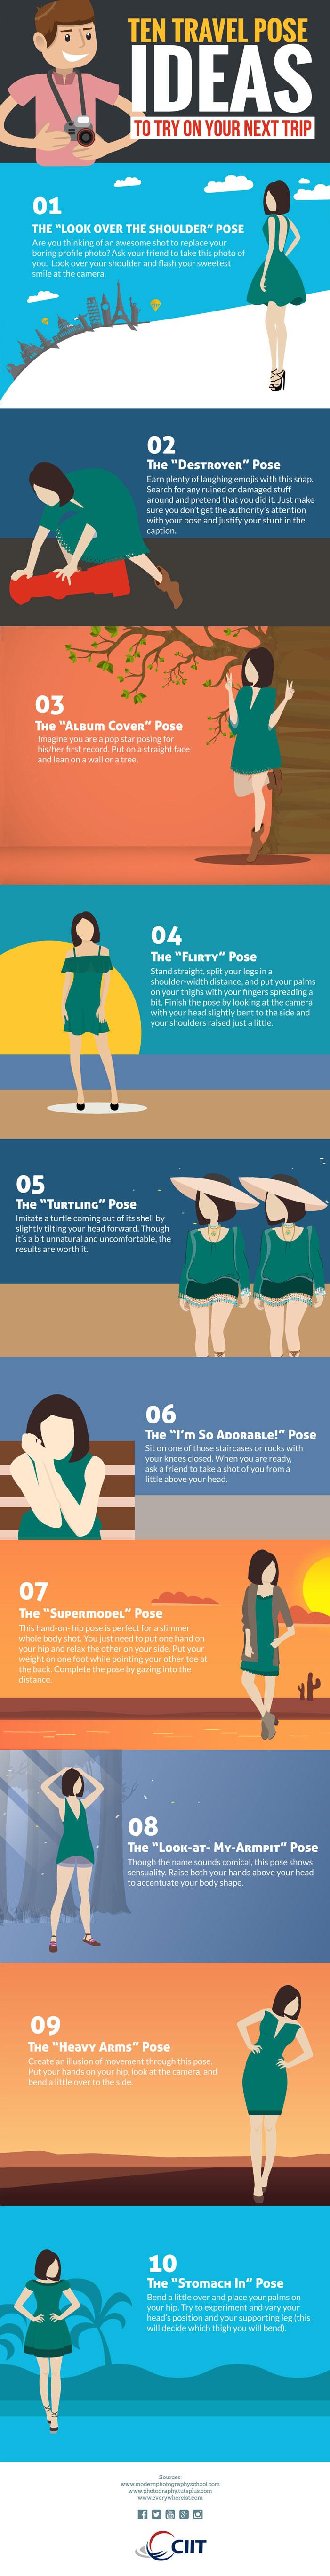 travel-pose-ideas